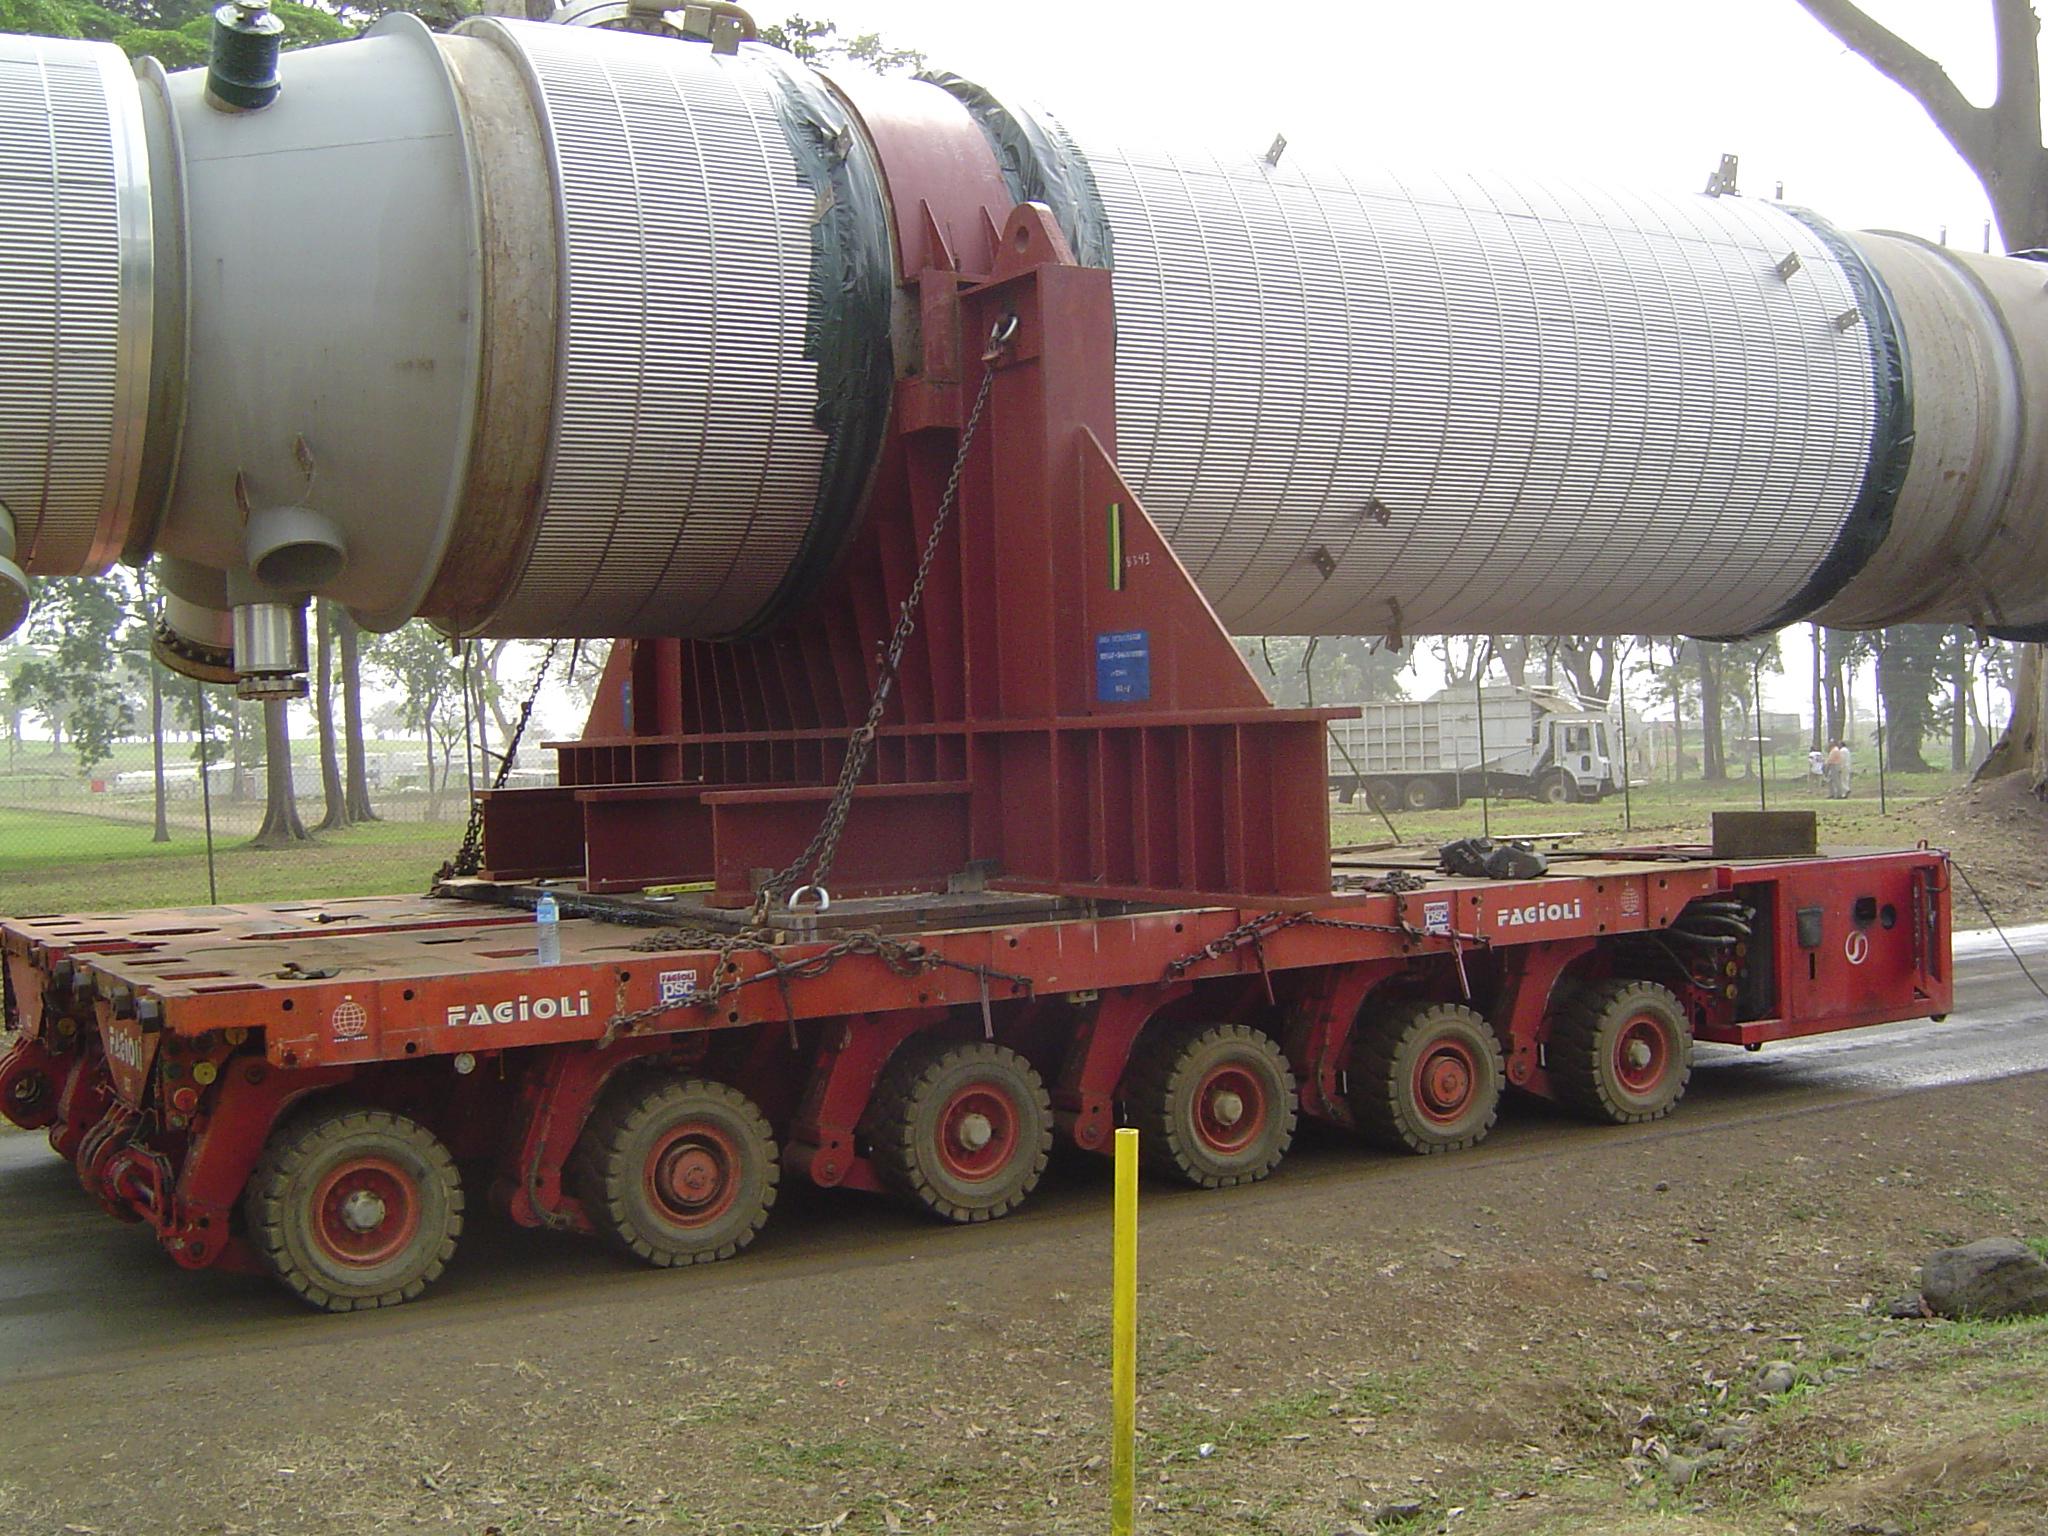 Alba phase 2 bioko island-equatorial Guinea, Africa silos transport and instellation